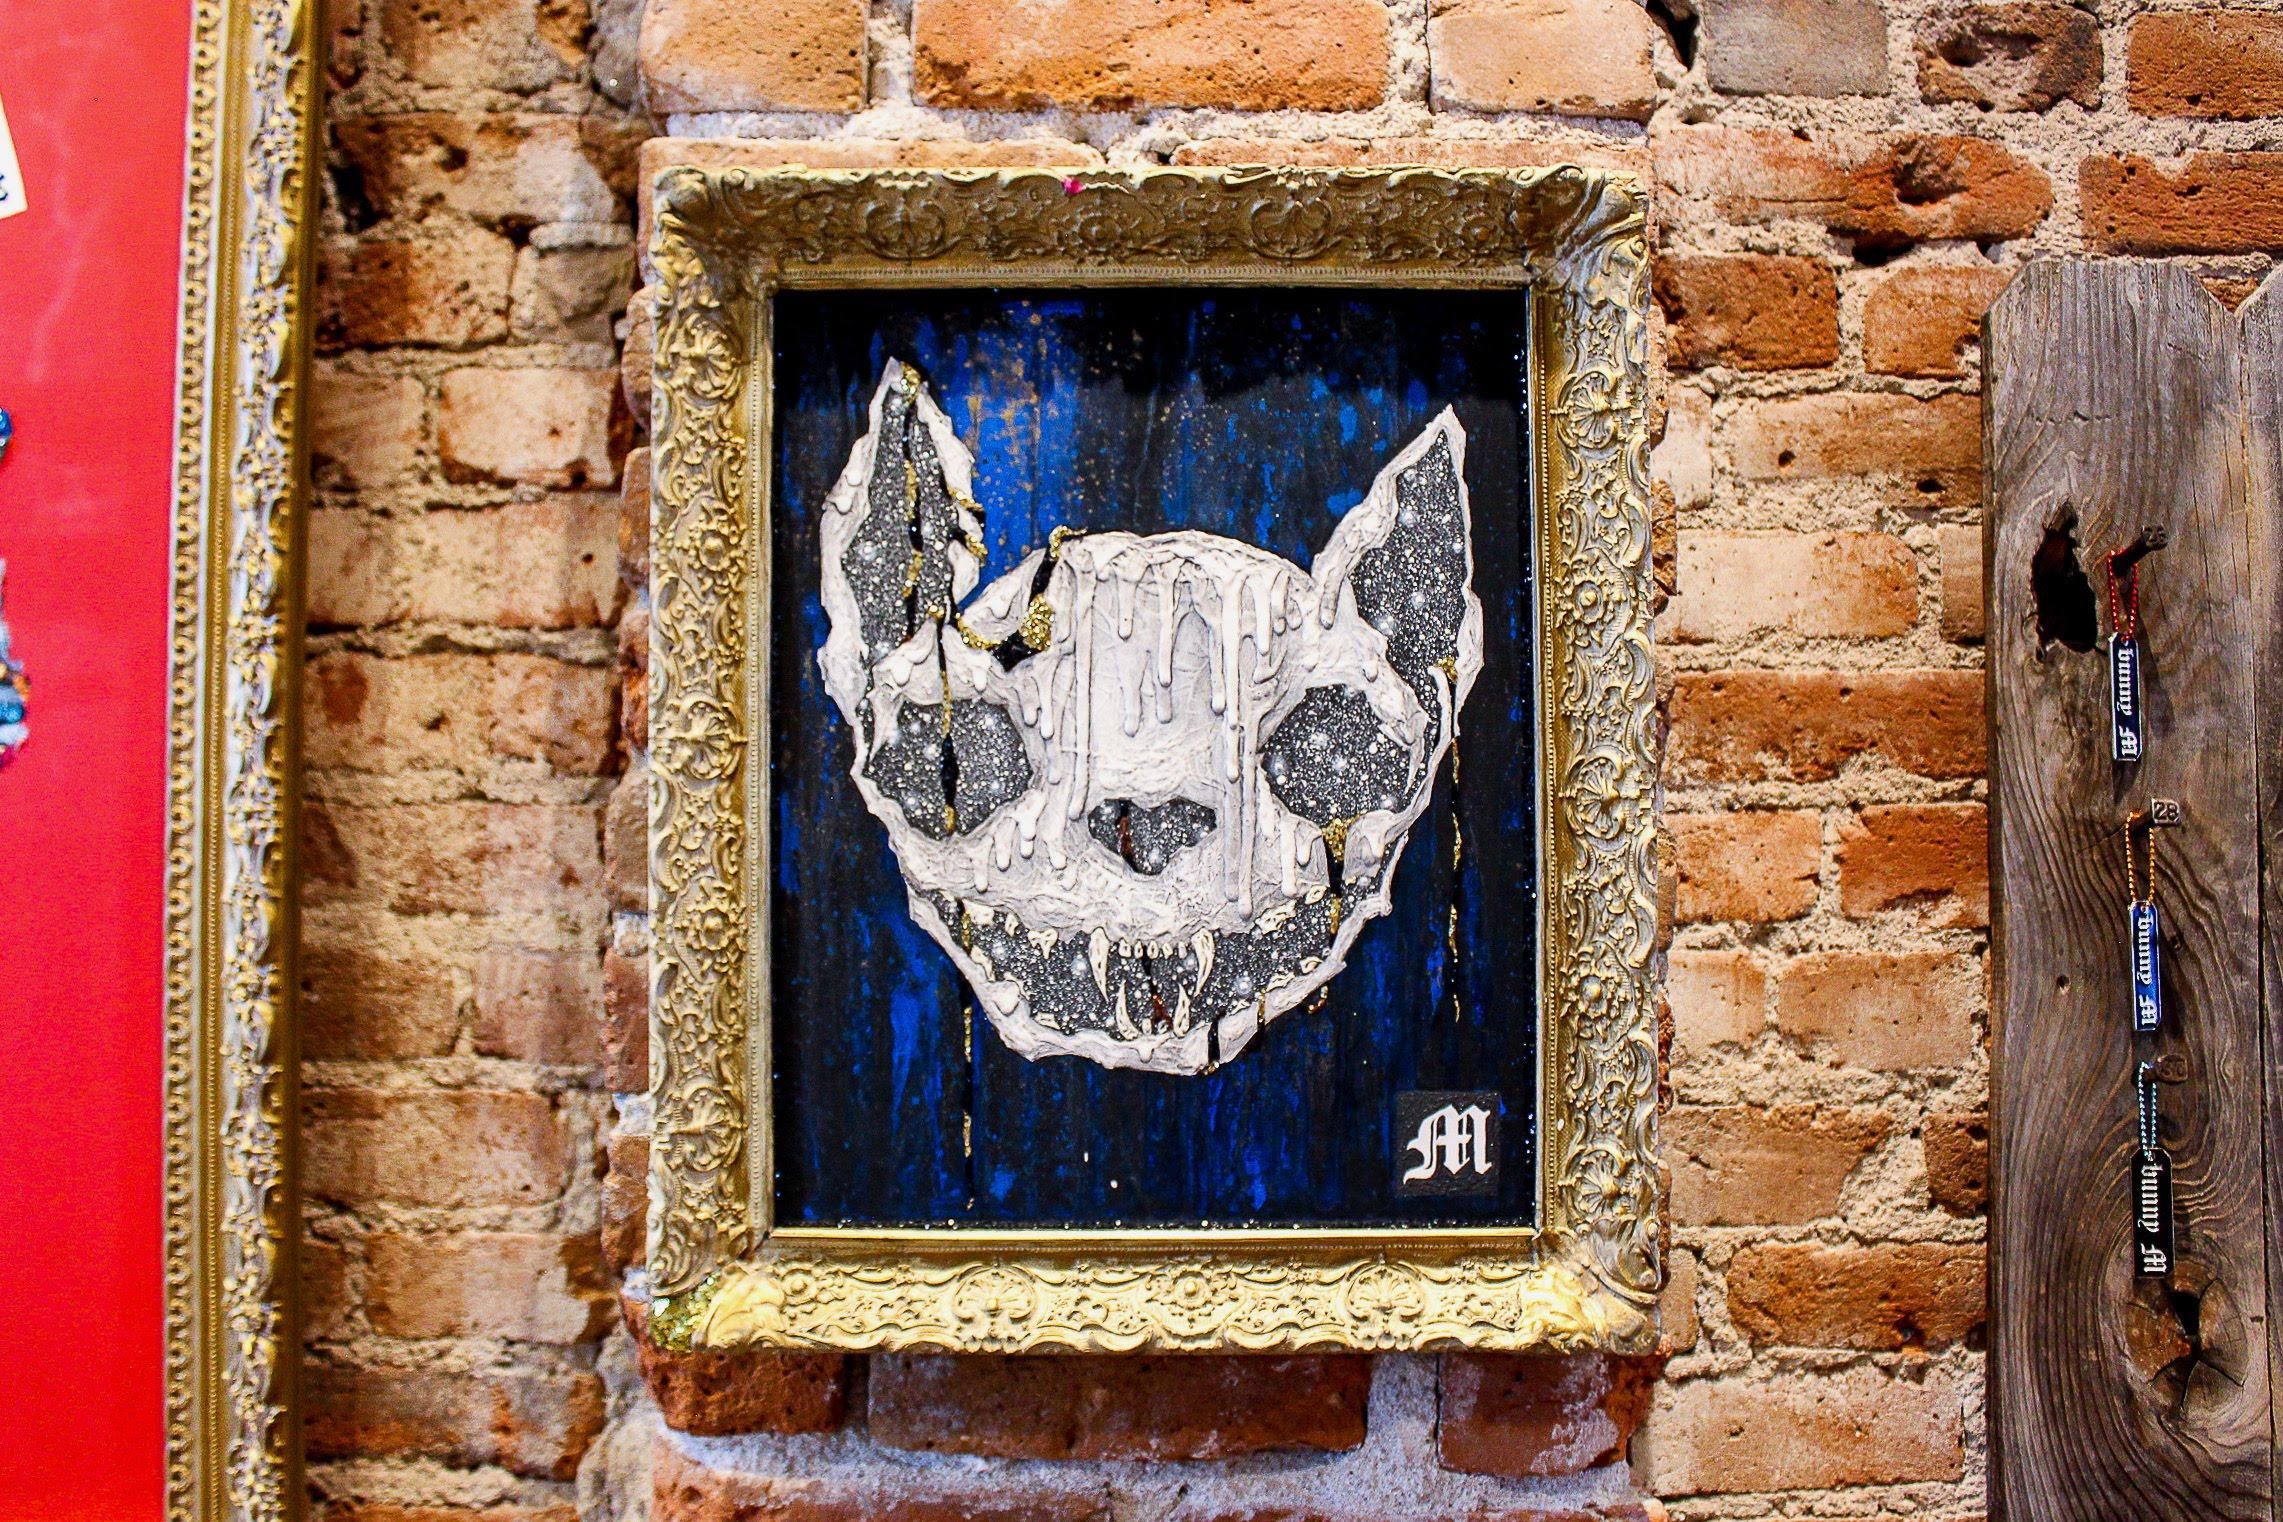 https://303magazine.com/2019/10/bunnym-leon-gallery-denver/